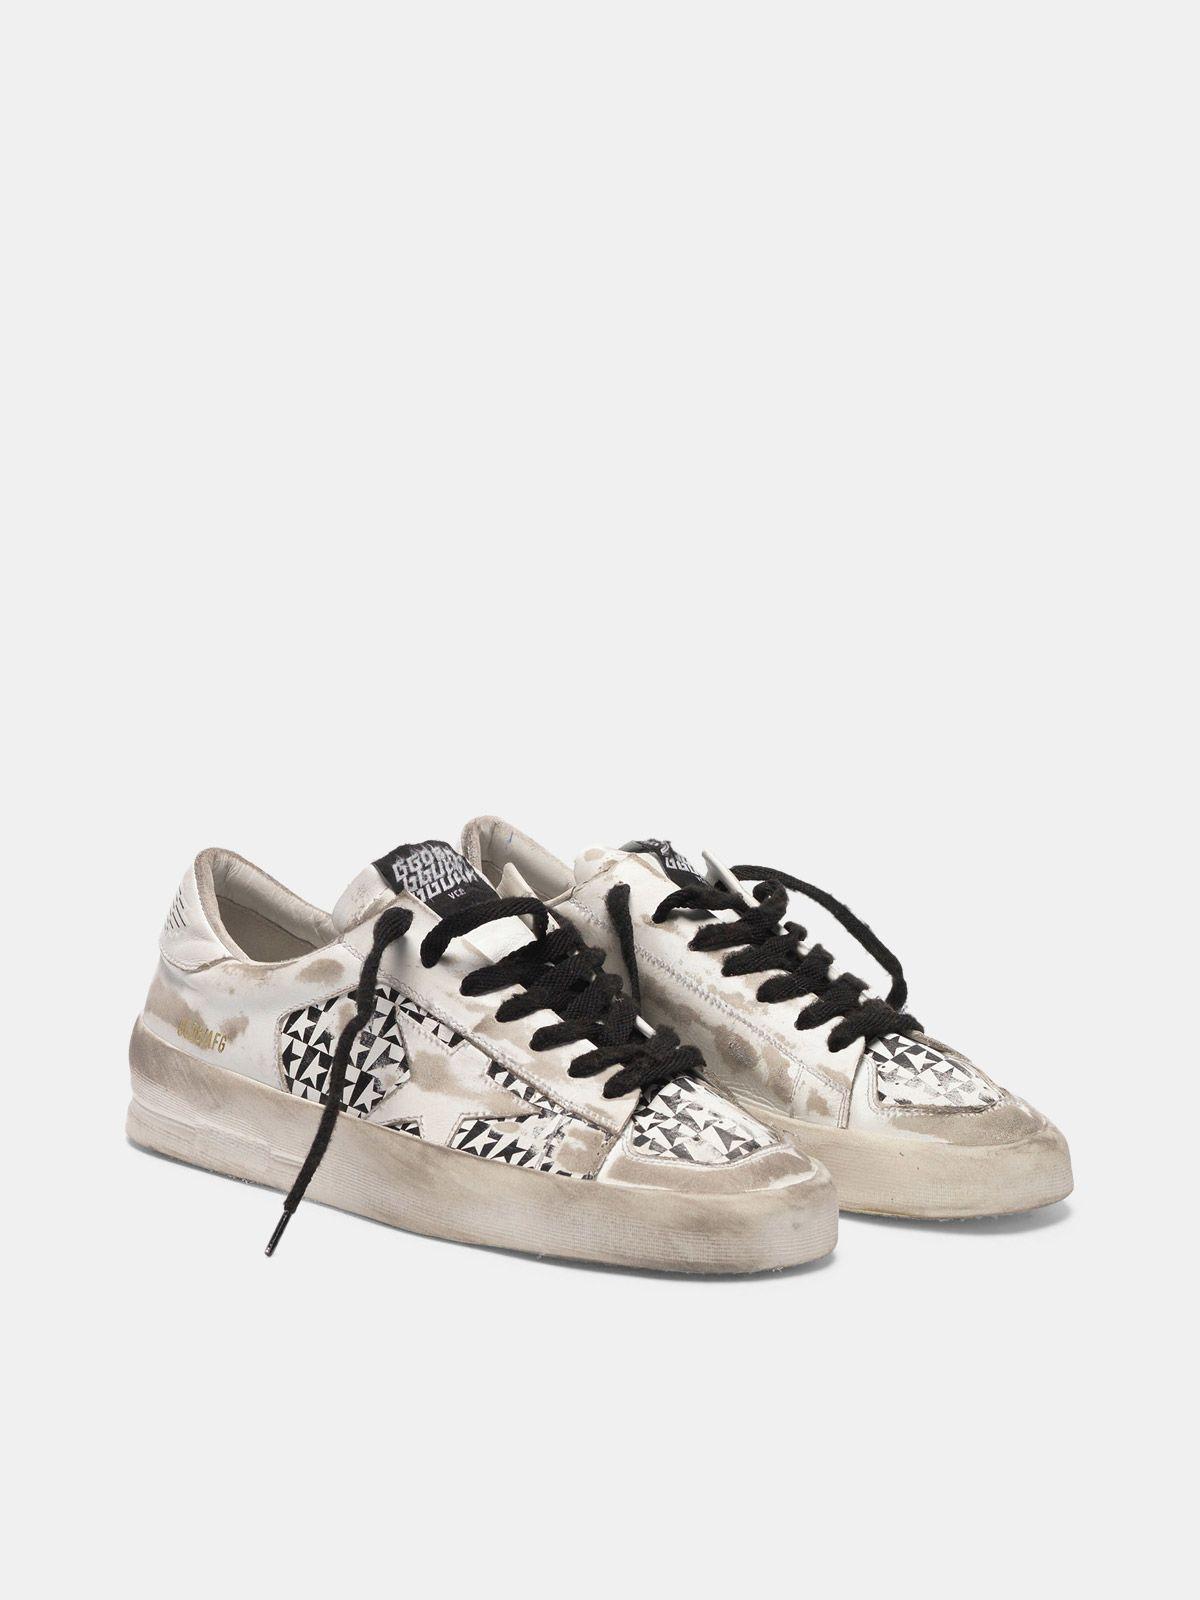 Golden Goose - Stardan LTD sneakers with checkerboard stars in